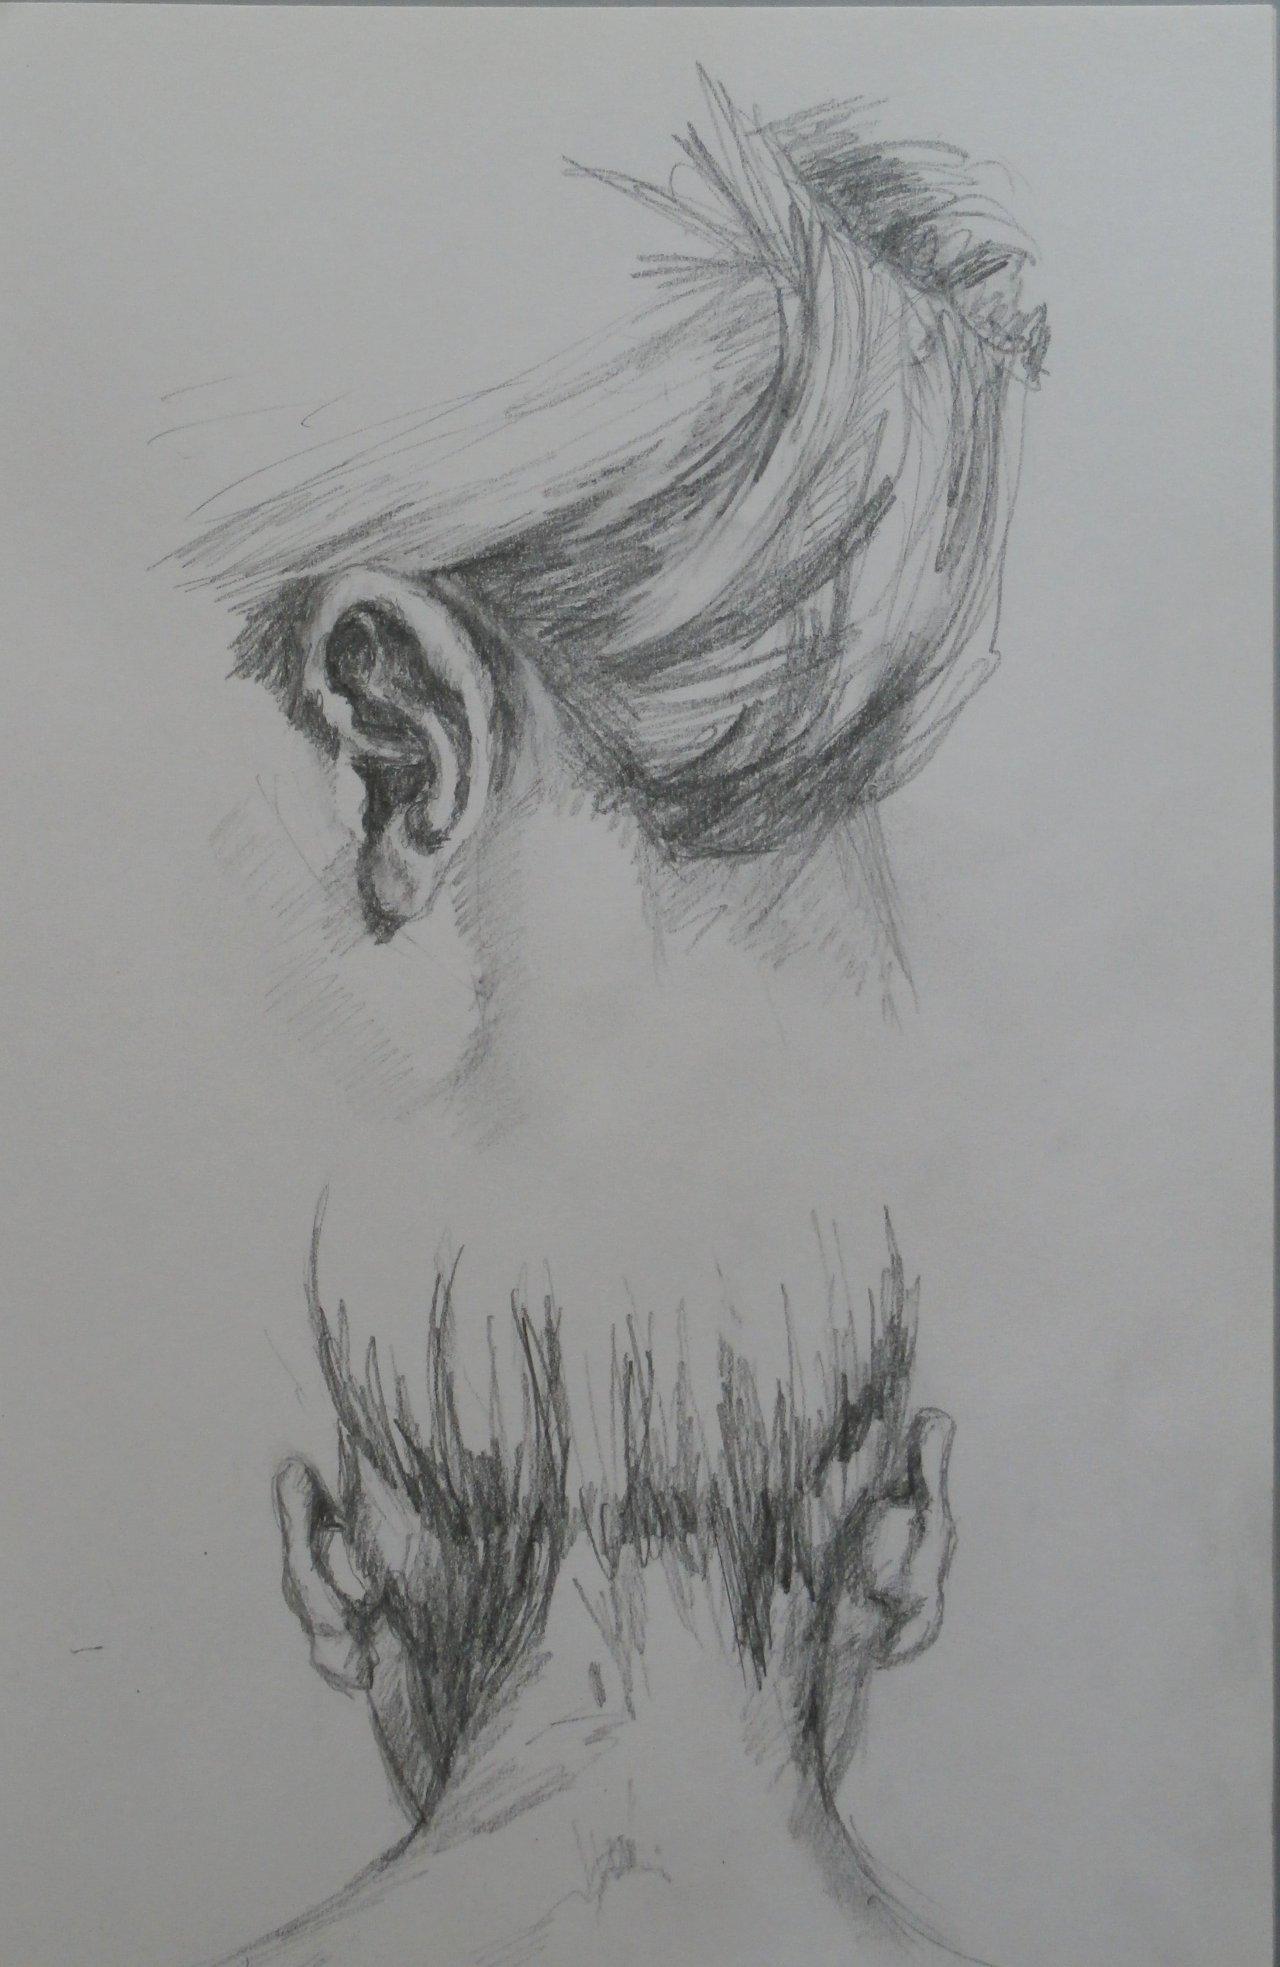 Nuque